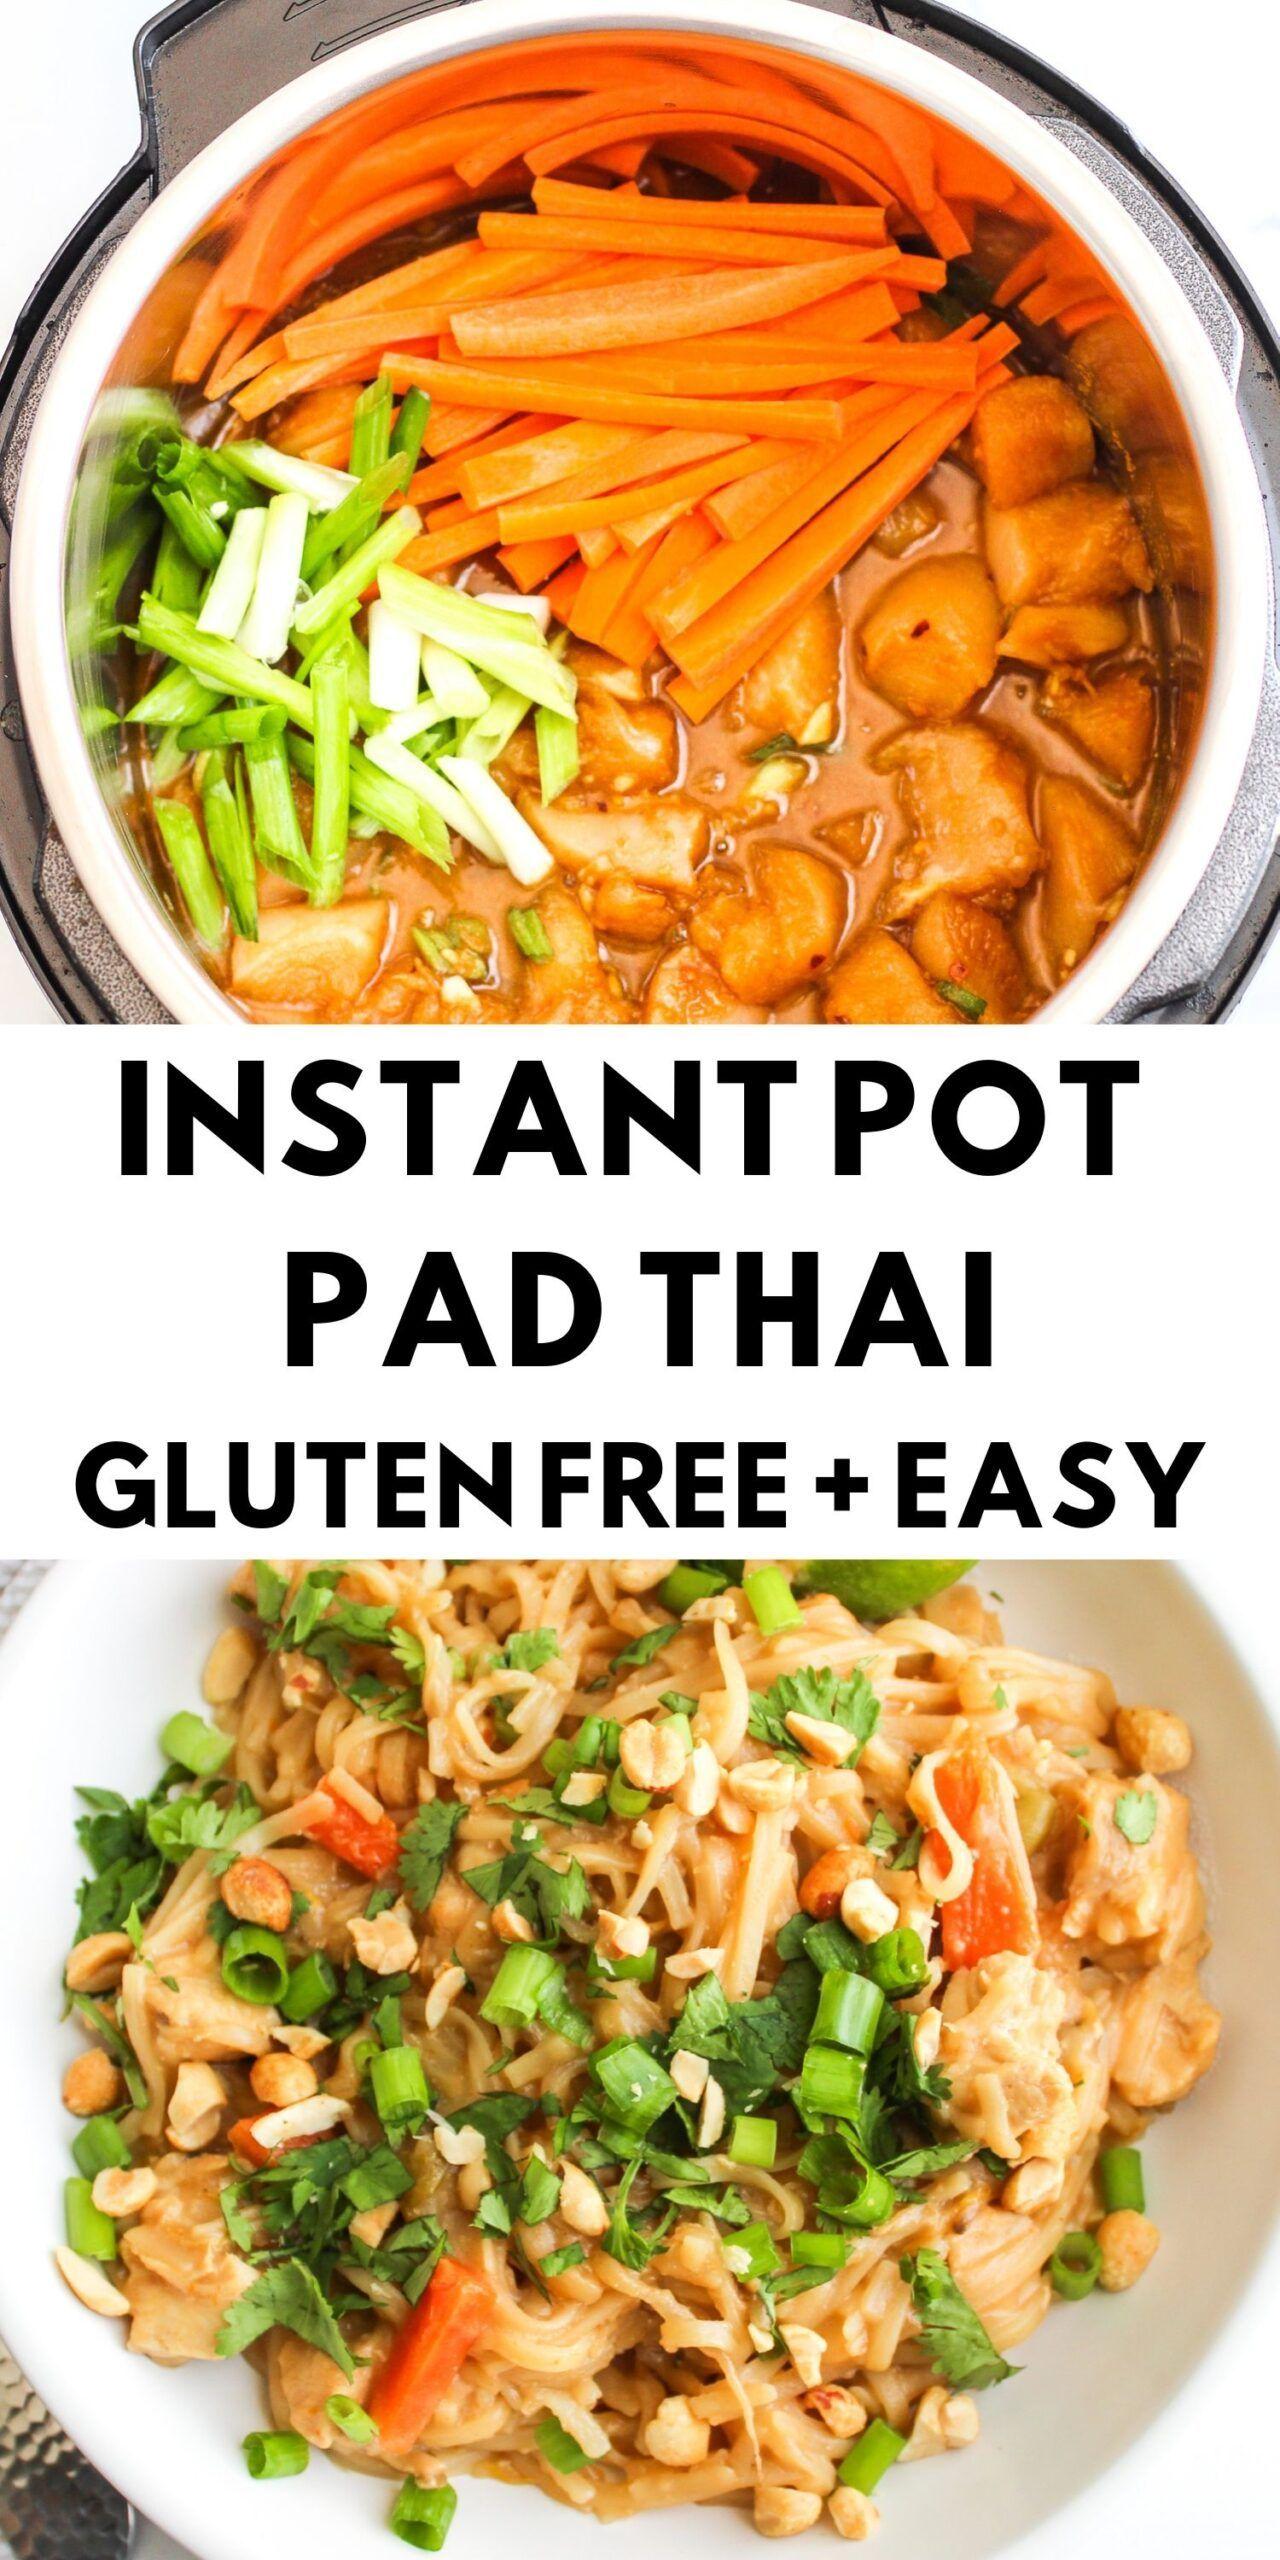 Instant Pot Pad Thai - Gluten Free -